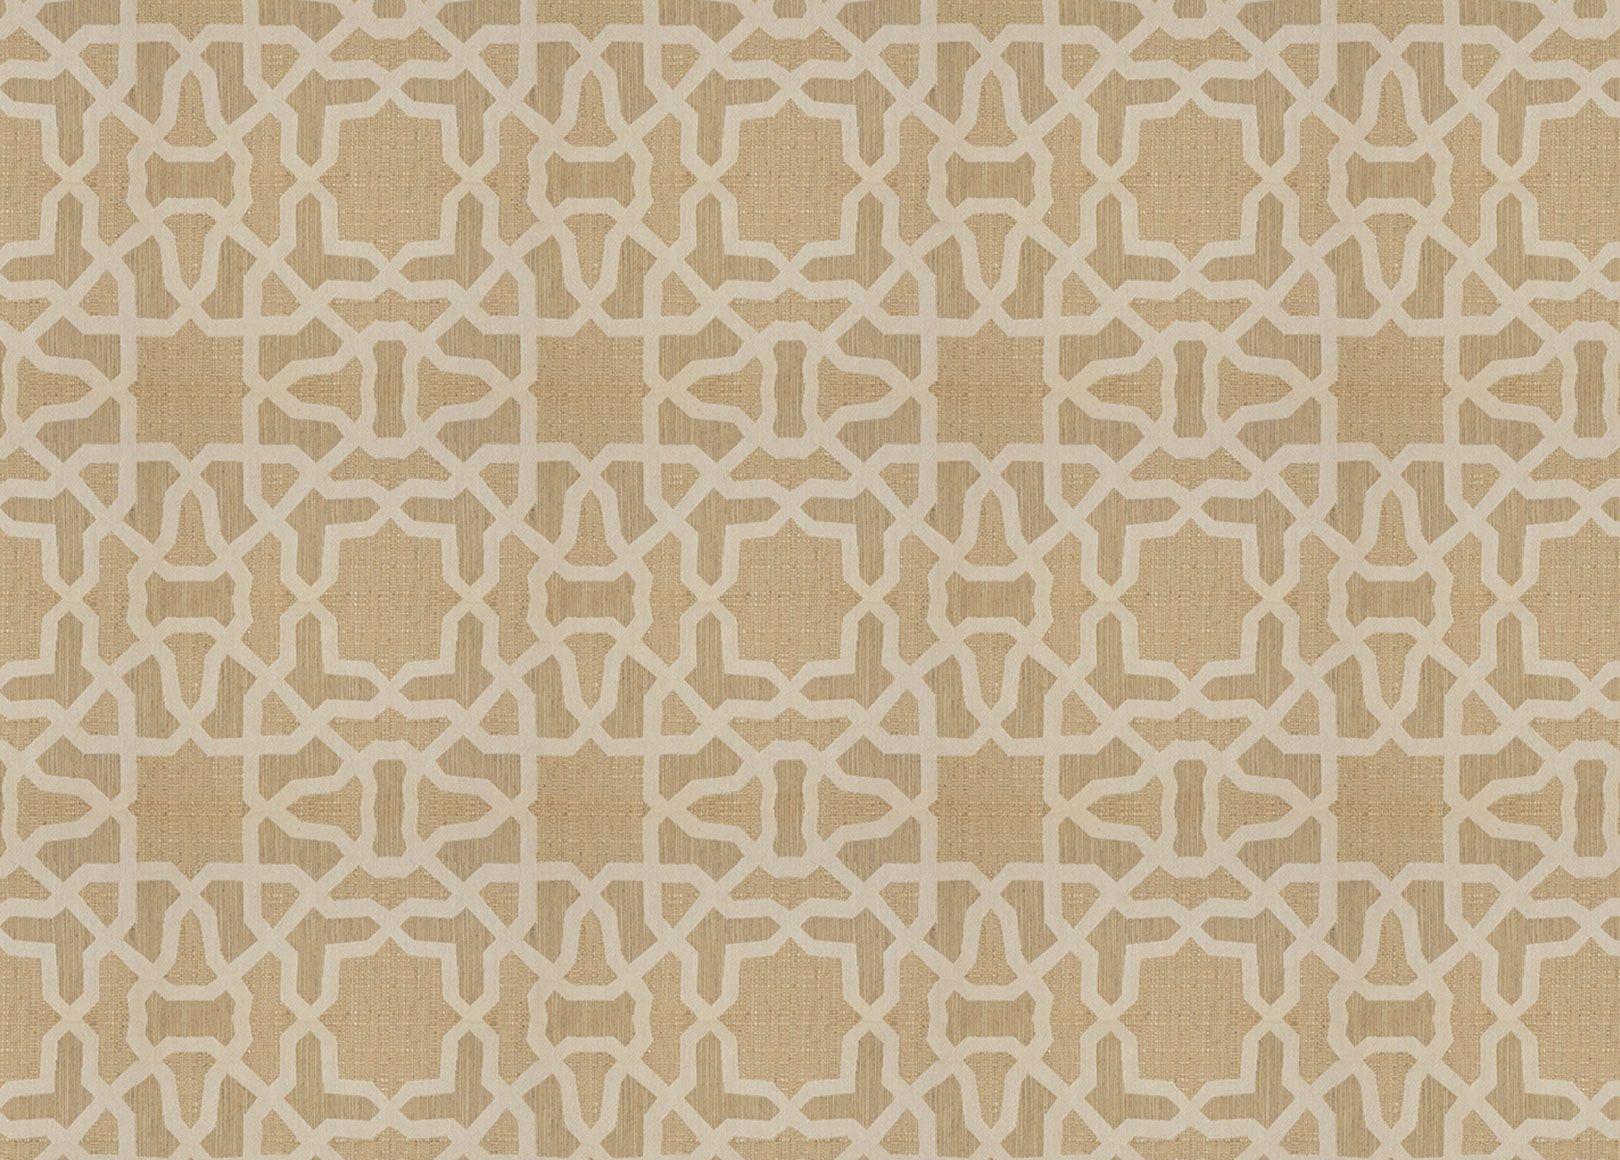 Mazy linen fabric ethan allen arcadia fabrics pinterest